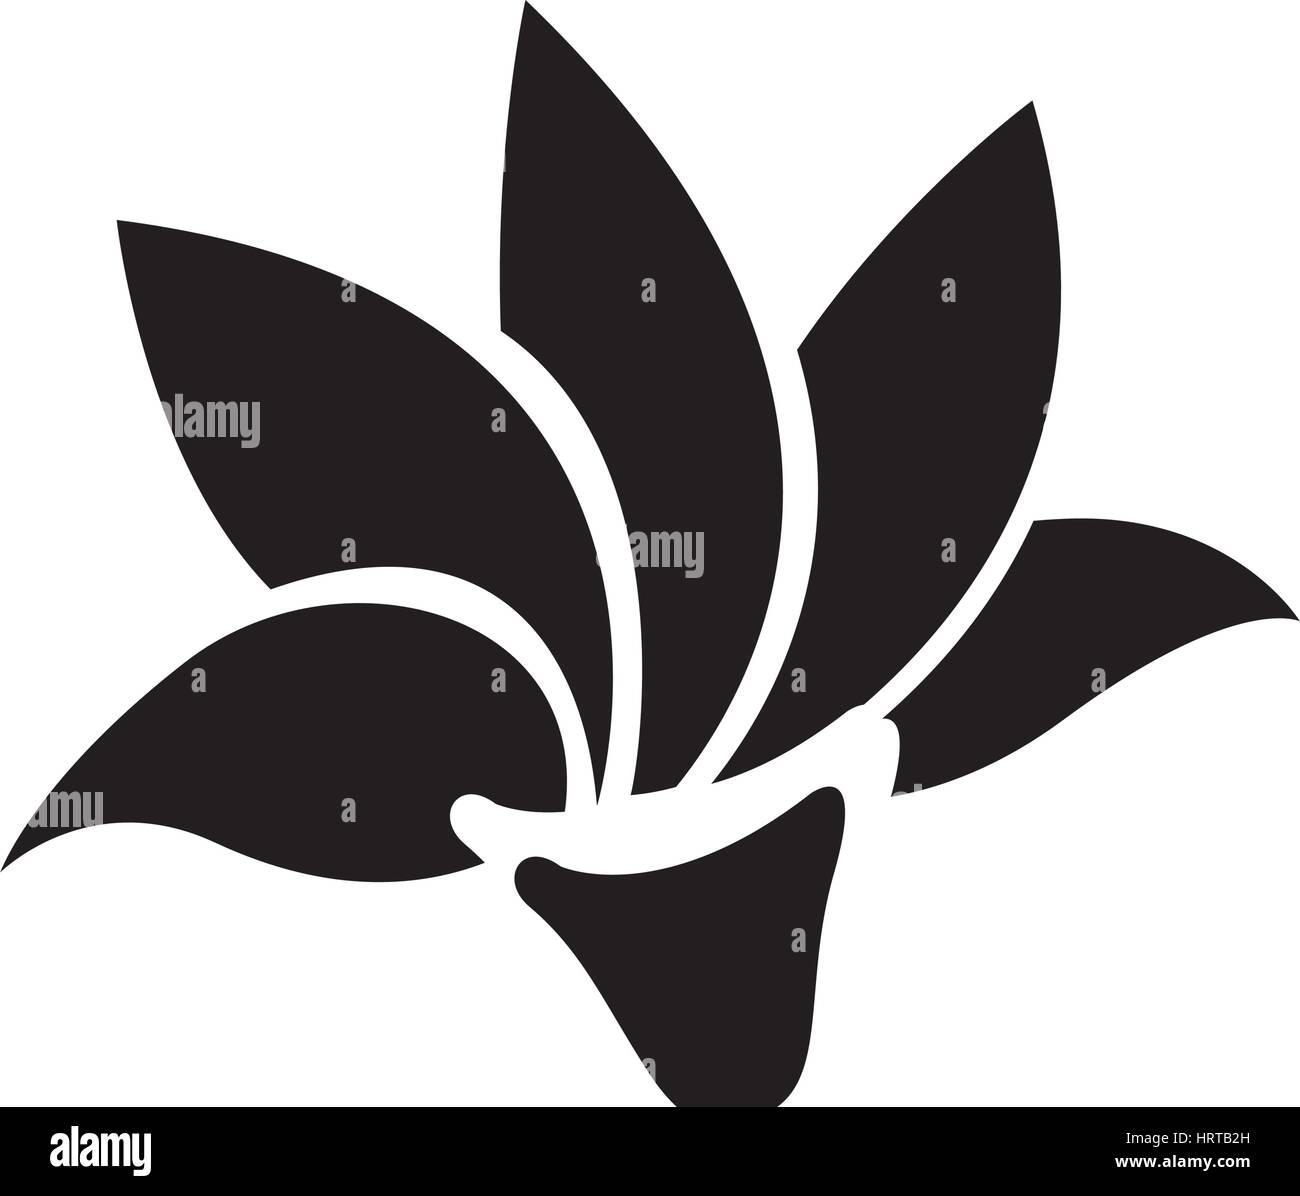 Icon Lotus Flower Silhouette Simple Stock Photos Icon Lotus Flower